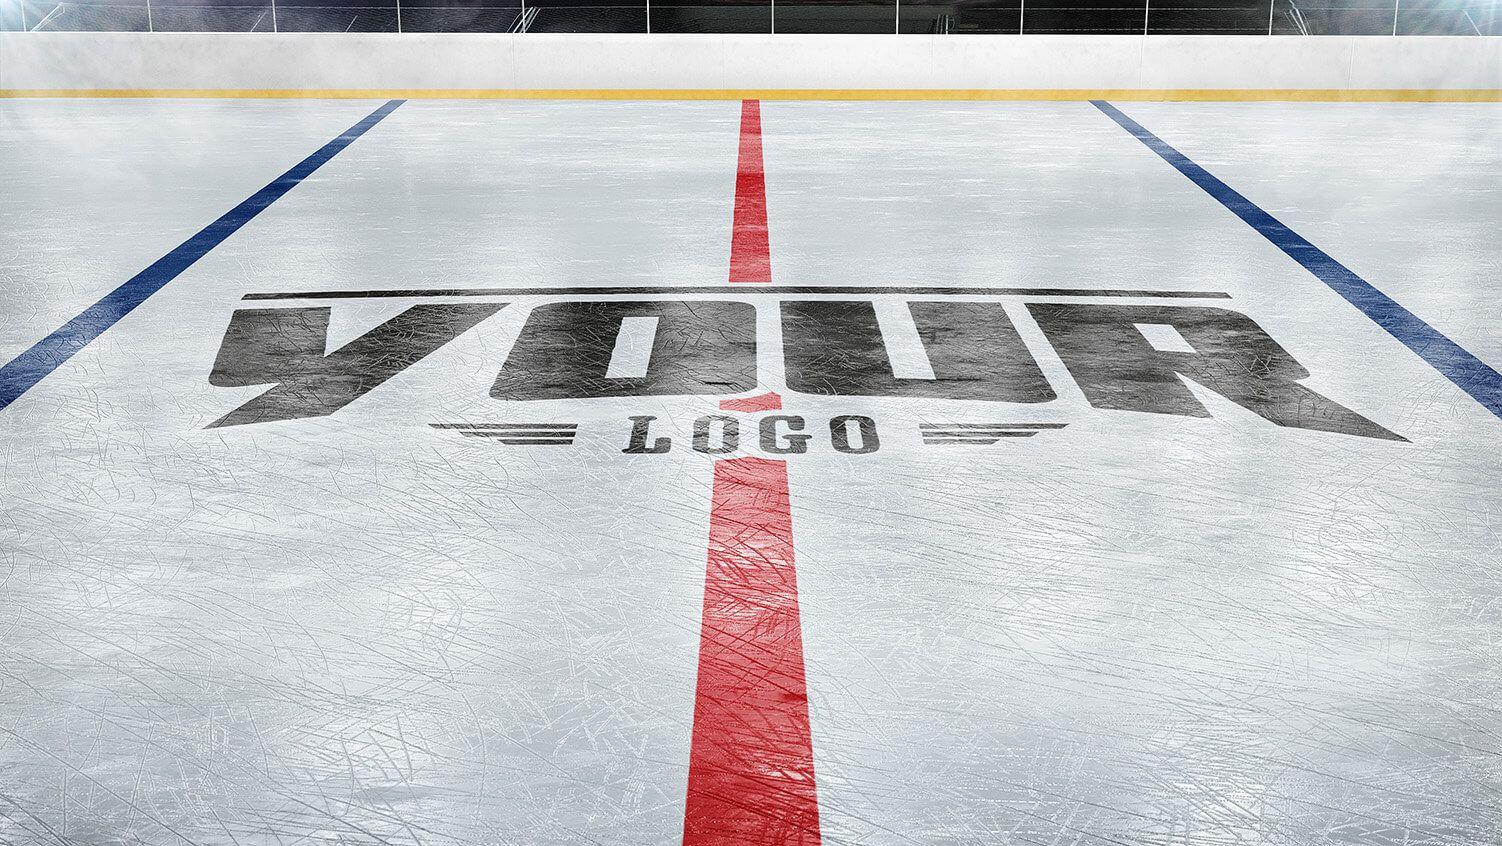 Download Ice Hockey Rink Photoshop Logo Mockup Ice Hockey Rink Photoshop Logo Logo Mockup